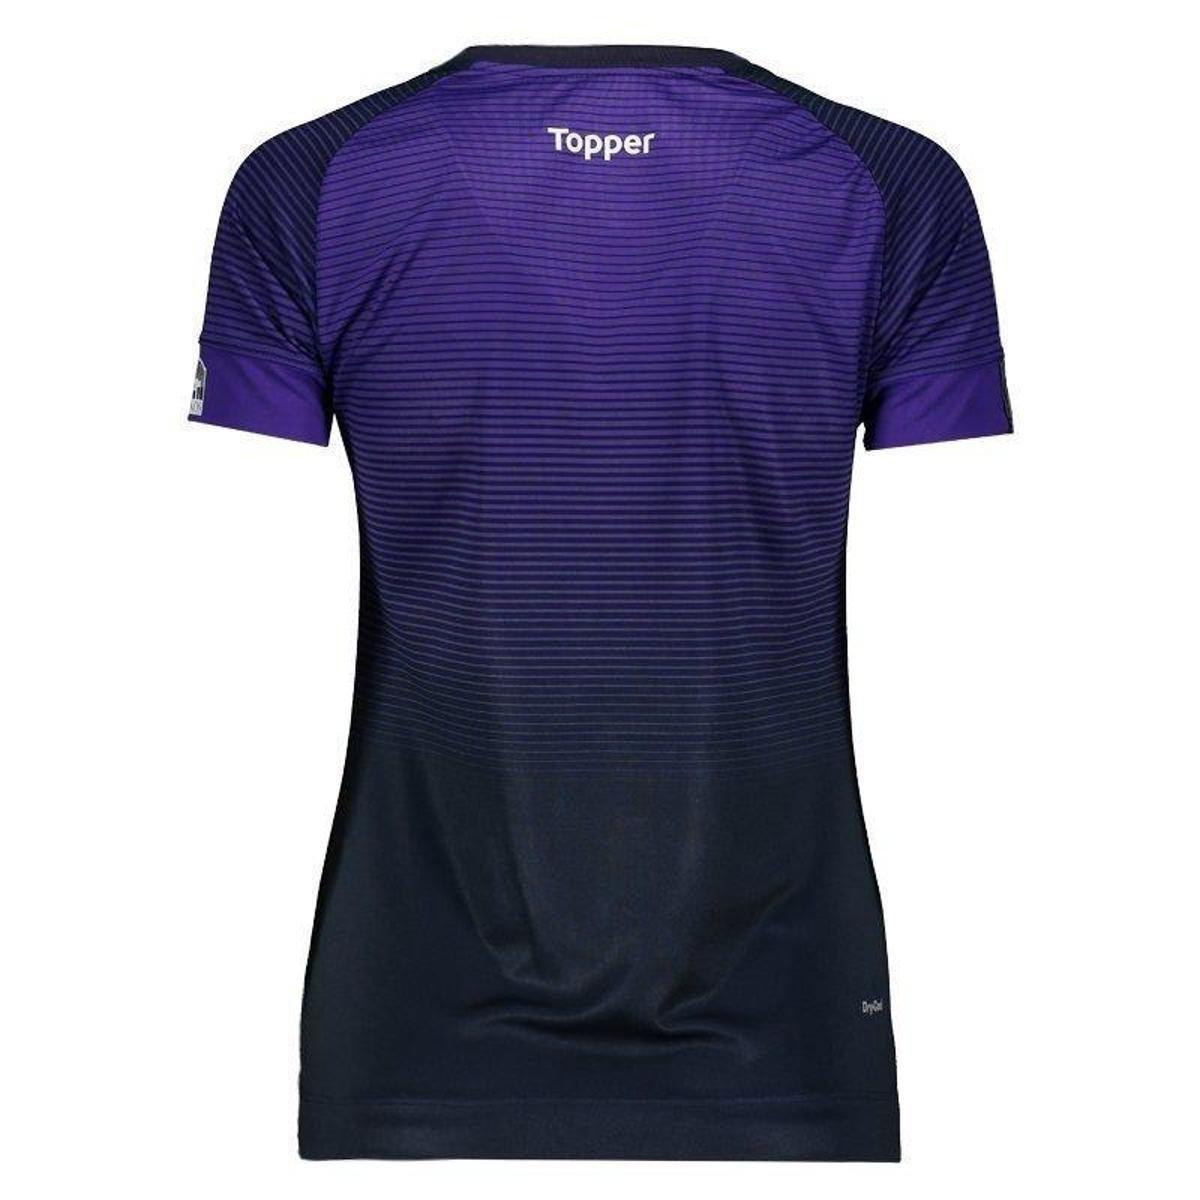 Feminina Roxo 2017 Remo Camisa 2017 Remo Topper III Topper Camisa III nanUxwv